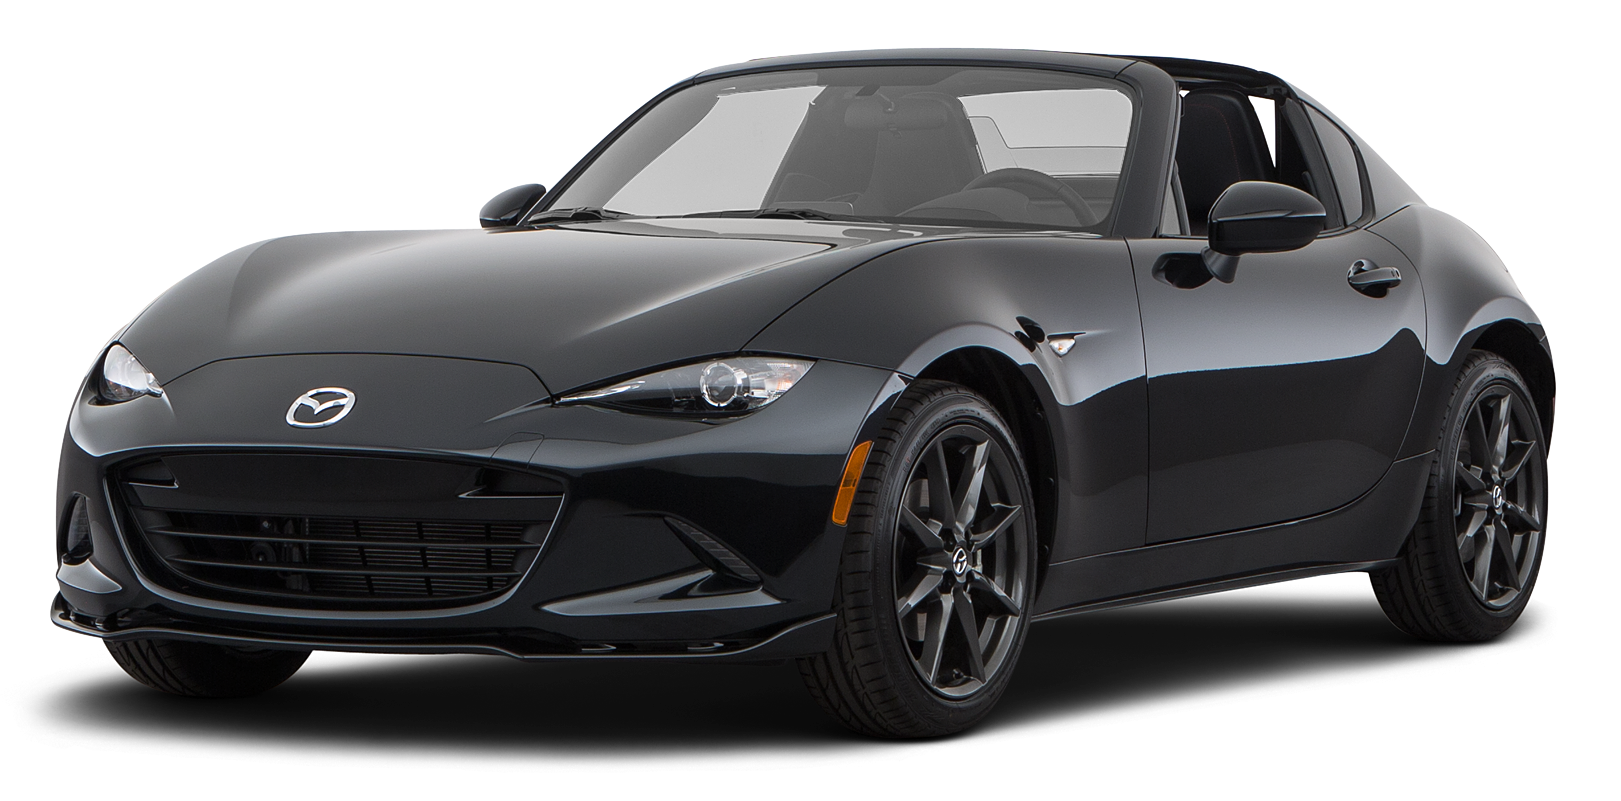 2018 Mazda Mazda MX 5 Miata RF Coupe